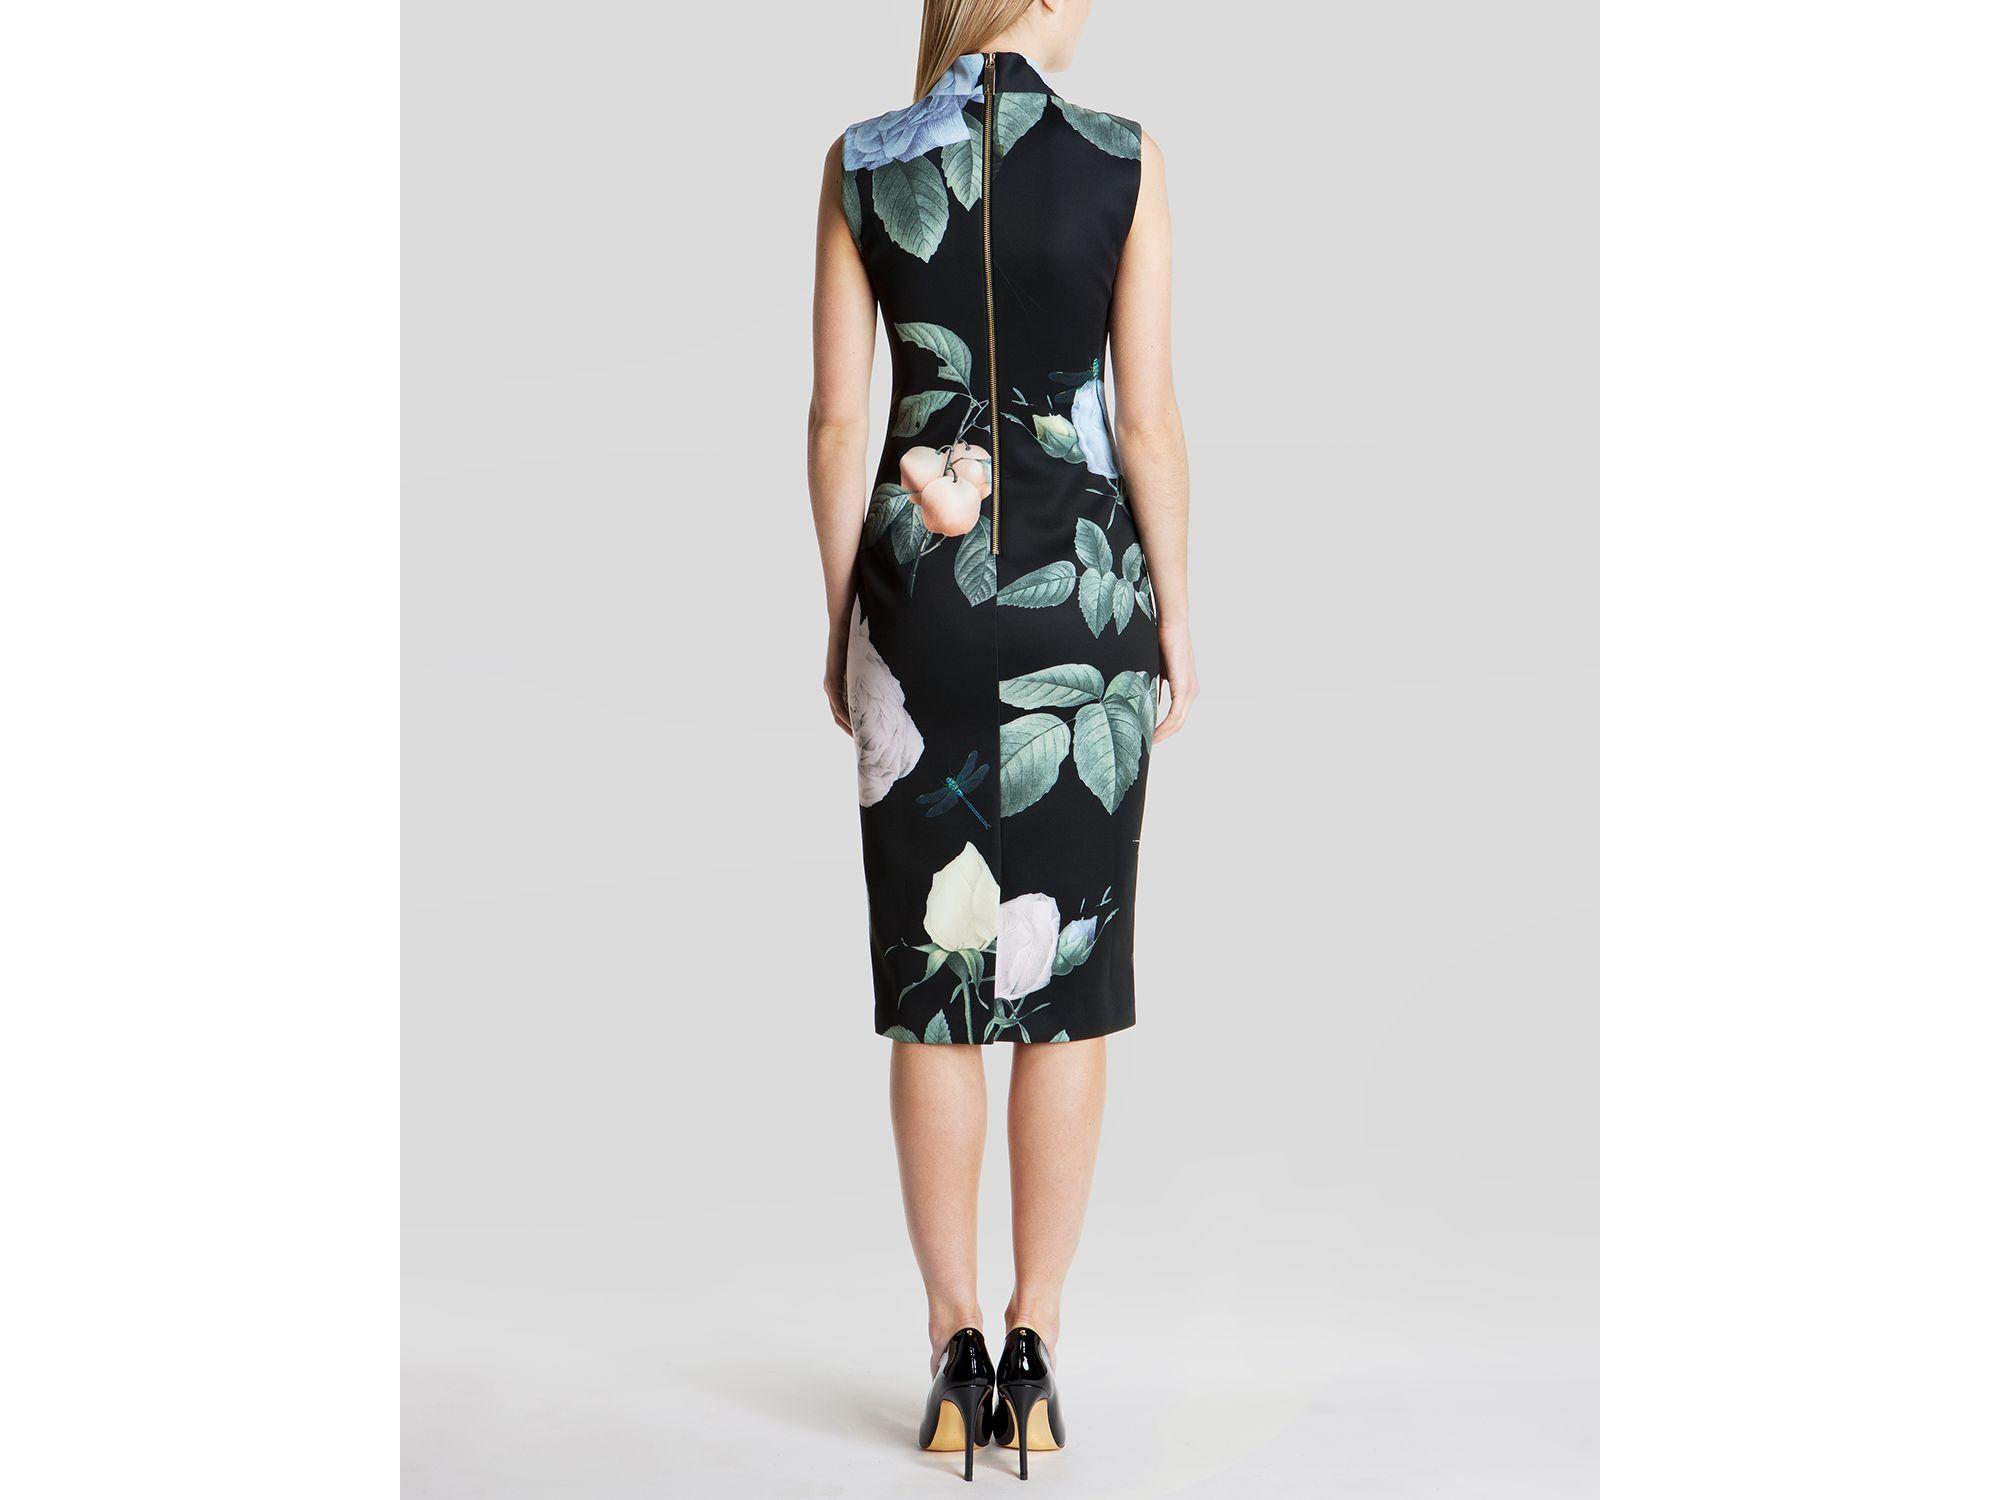 0cc528ab9360f Lyst - Ted Baker Dress - Ravina Distinguished Rose in Black